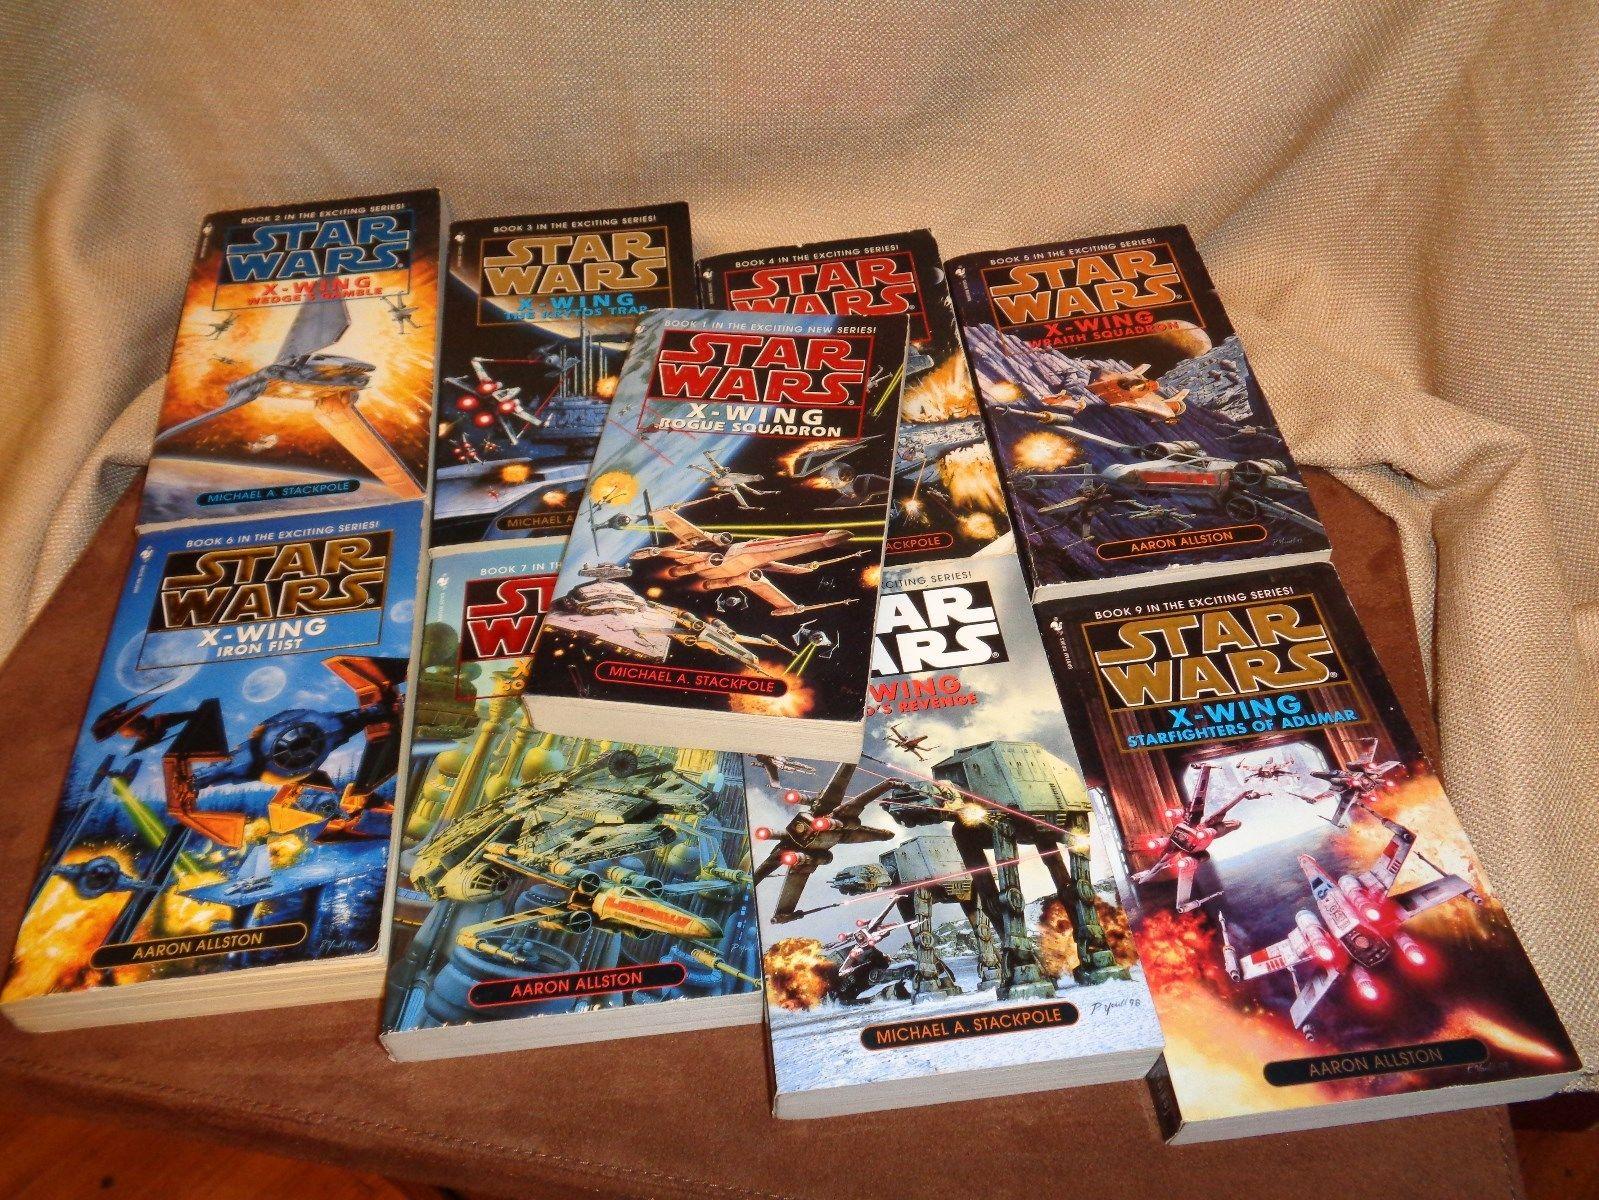 star-wars-x-wing-series-set-of-9-books